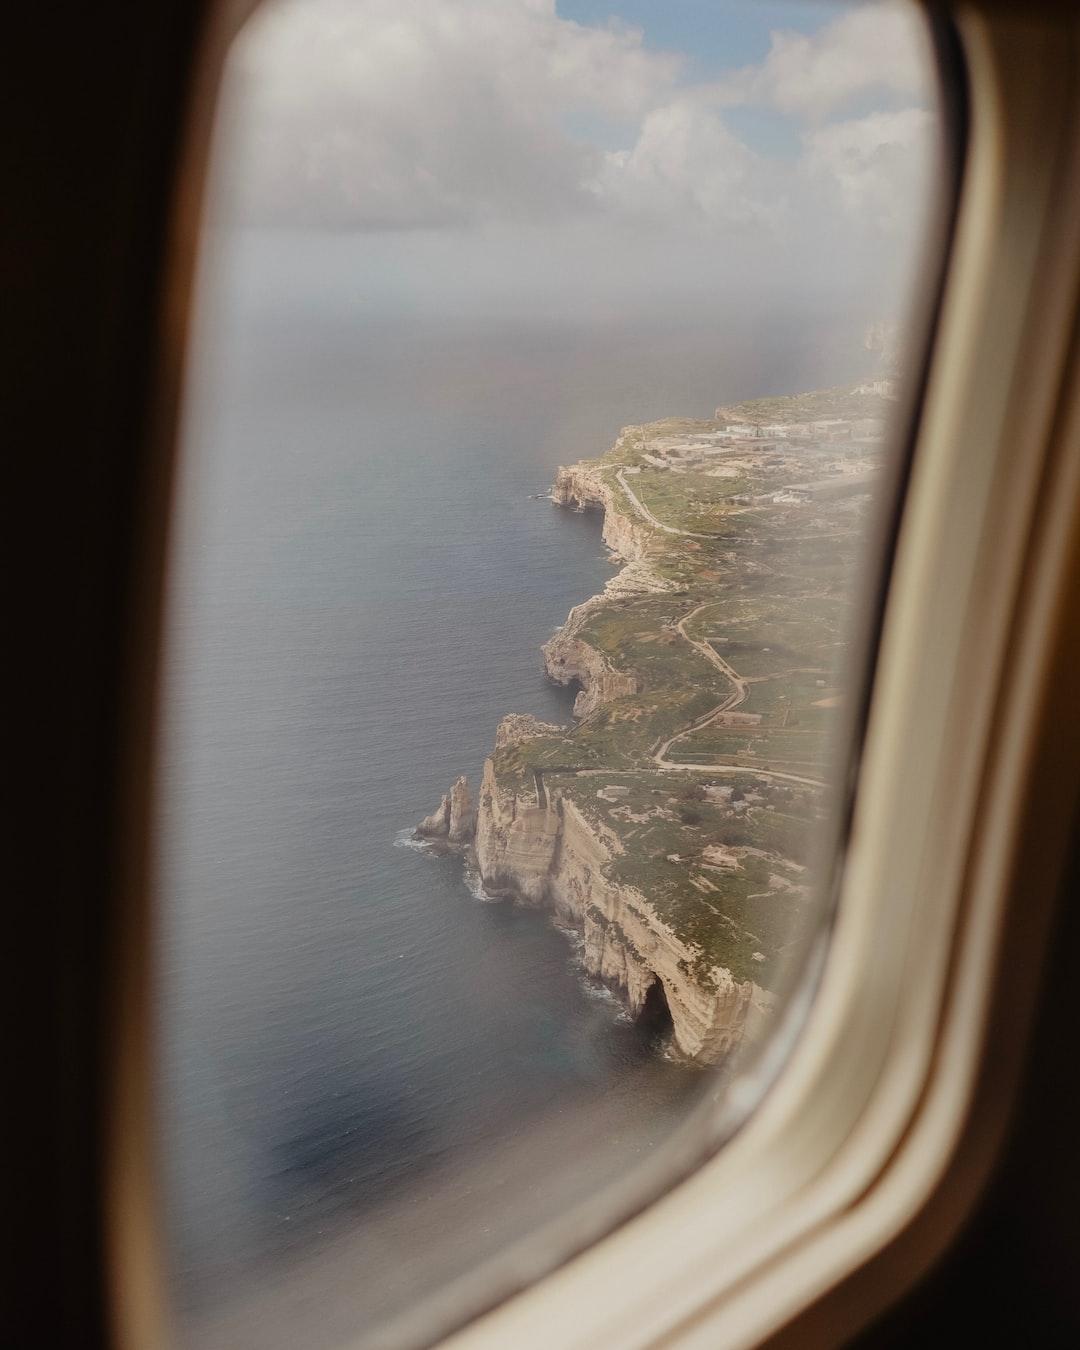 Landing in Malta 🇲🇹